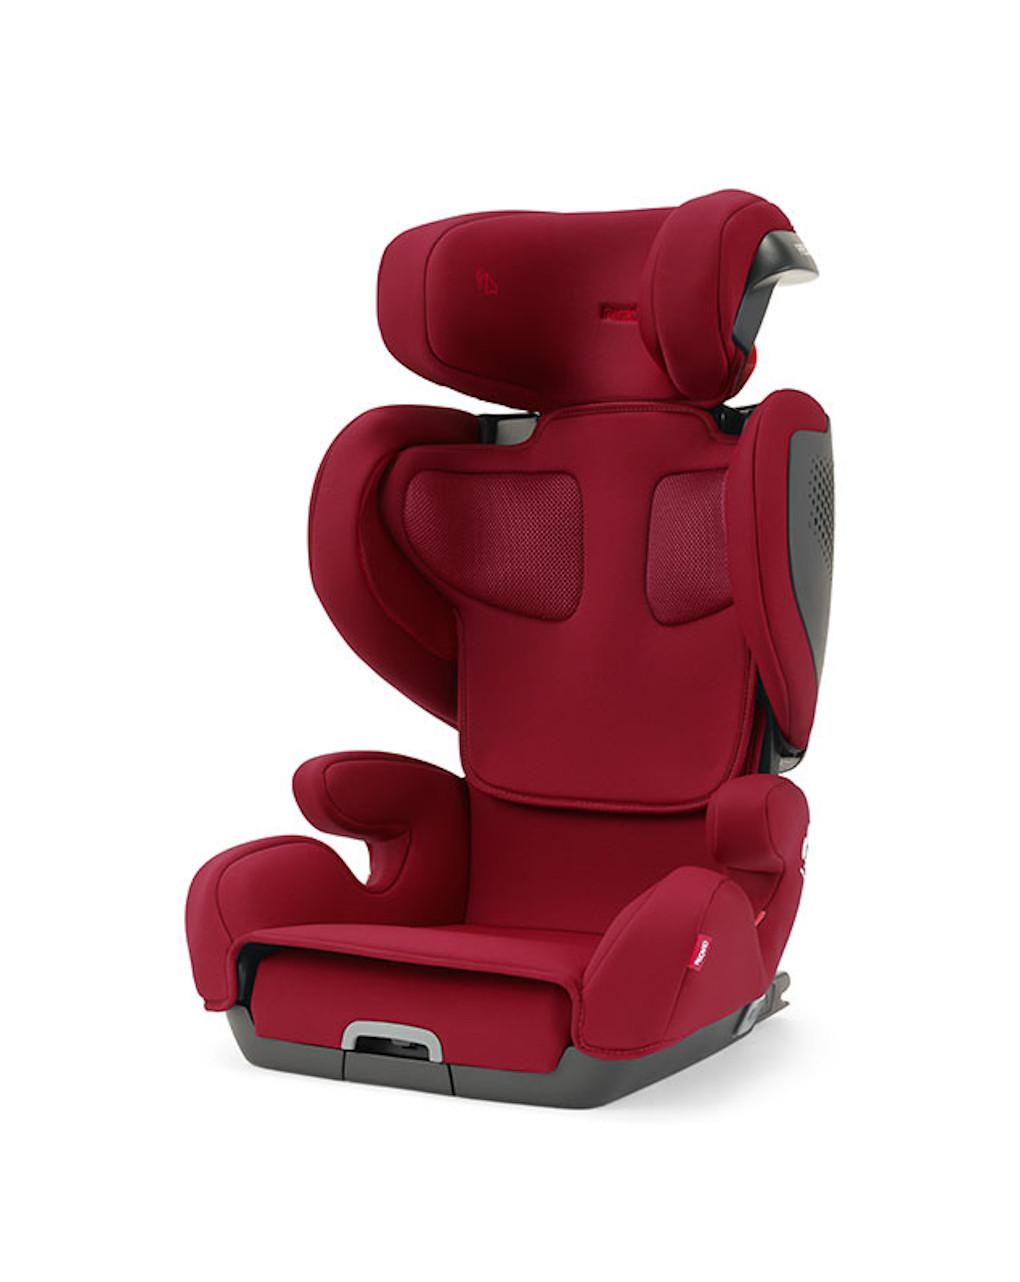 Recaro seggiolino auto mako elite – select garnet red - Recaro